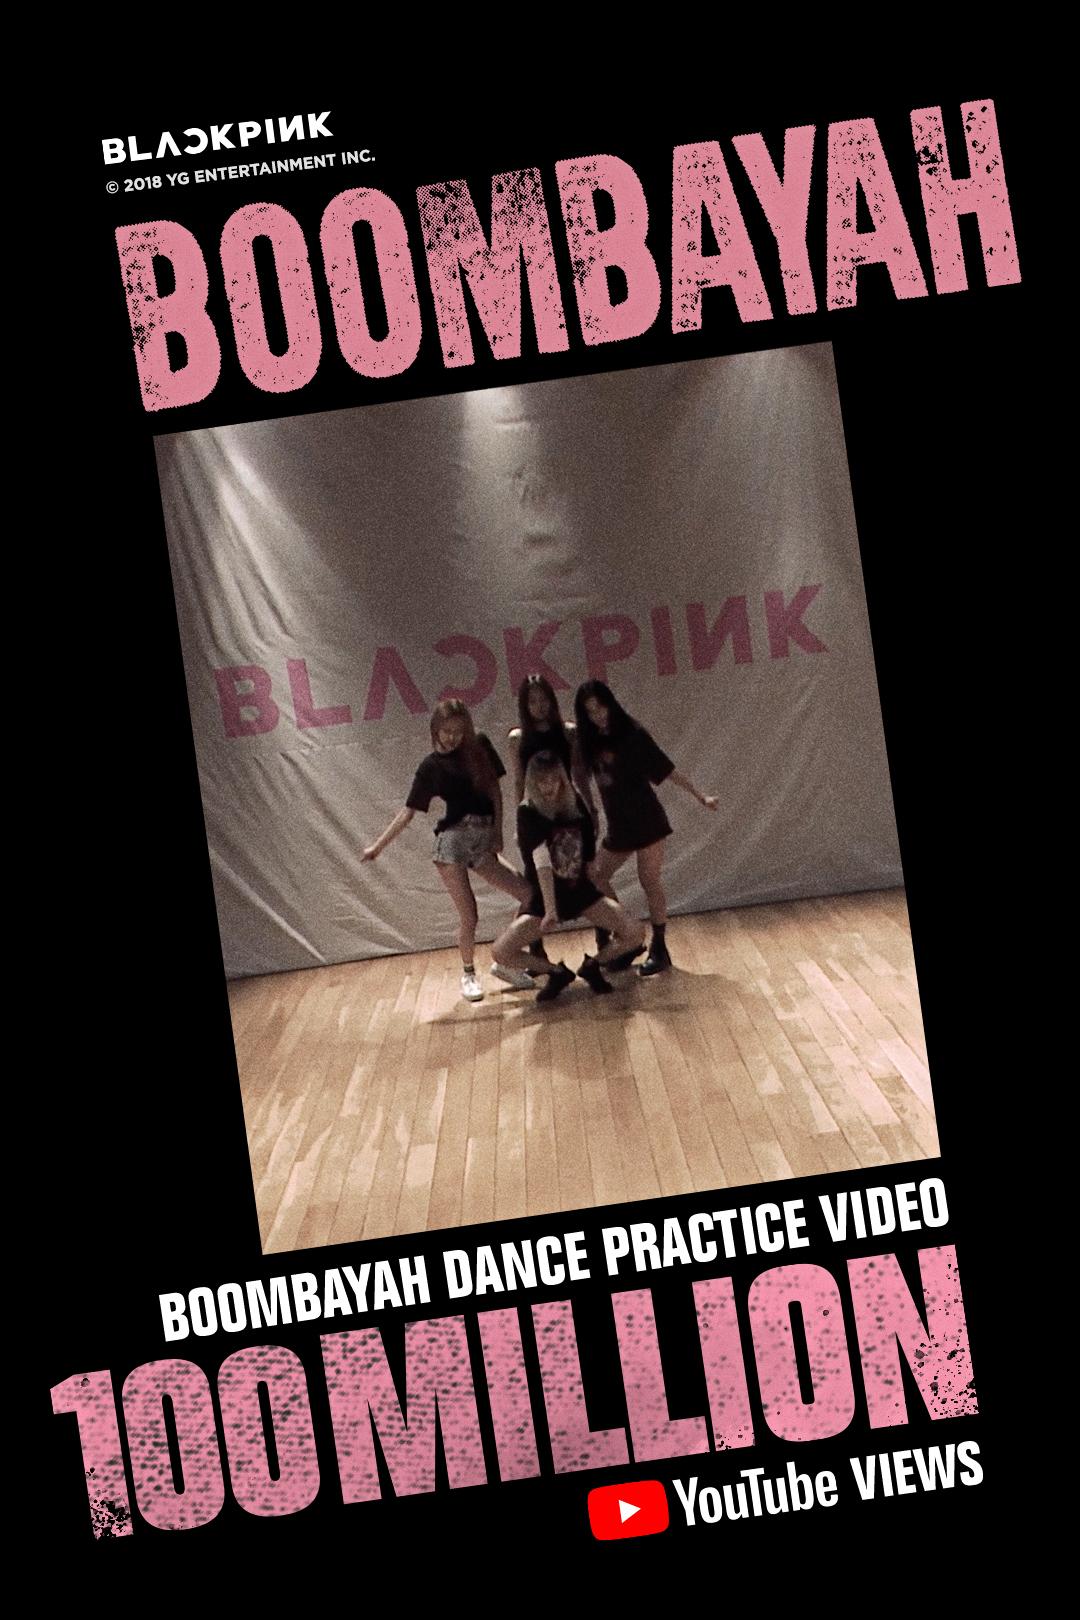 [BLACKPINK]BOOMBAYAH_CHOREO_1M(a)